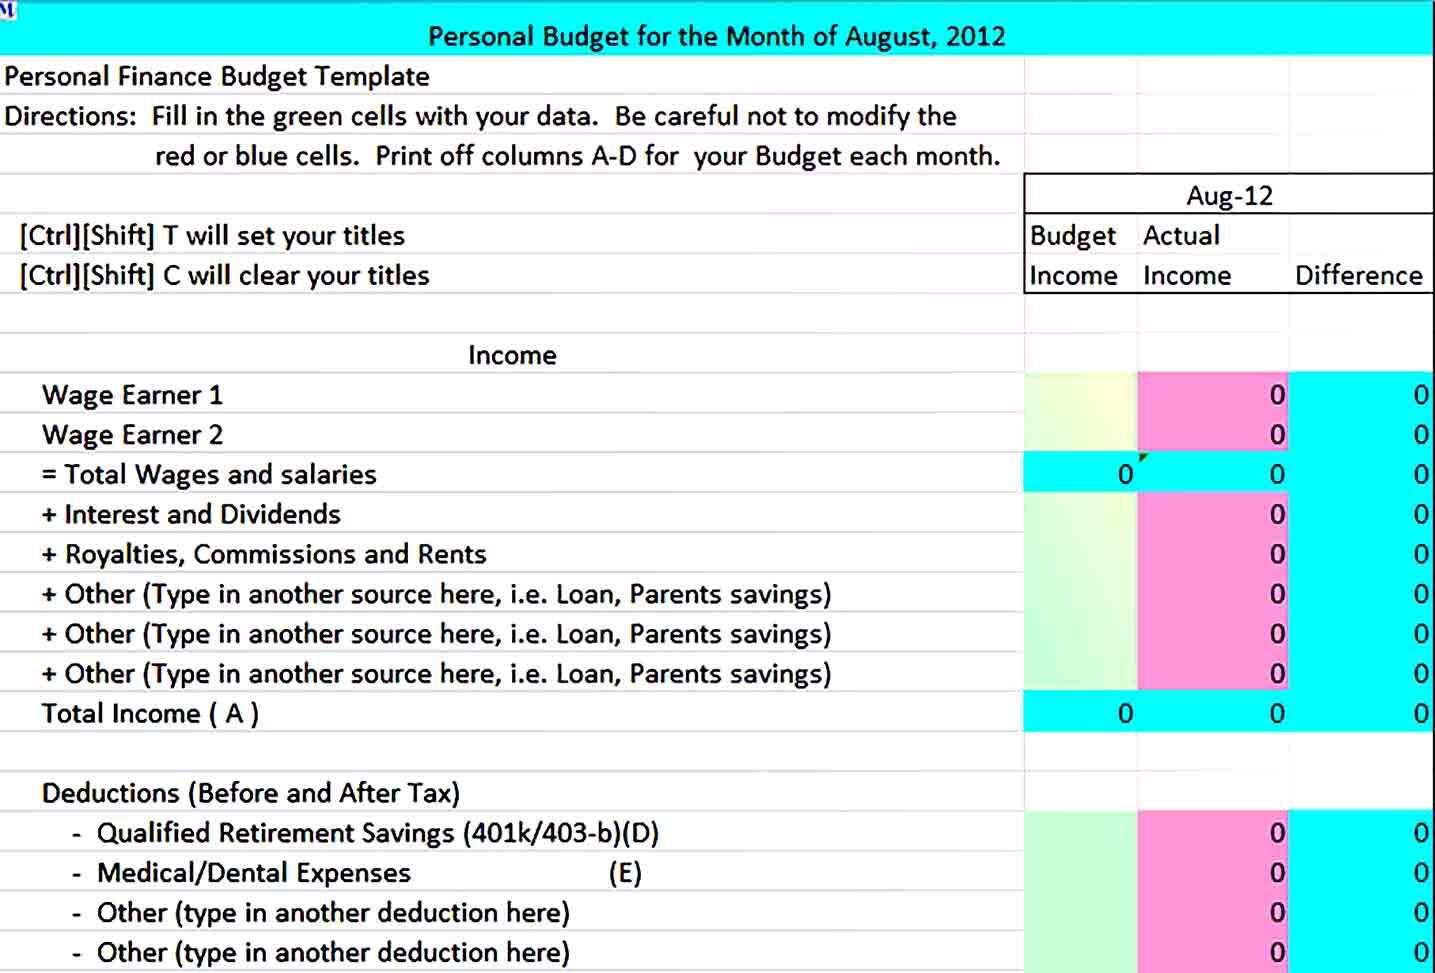 Sample Personal Finance Budget